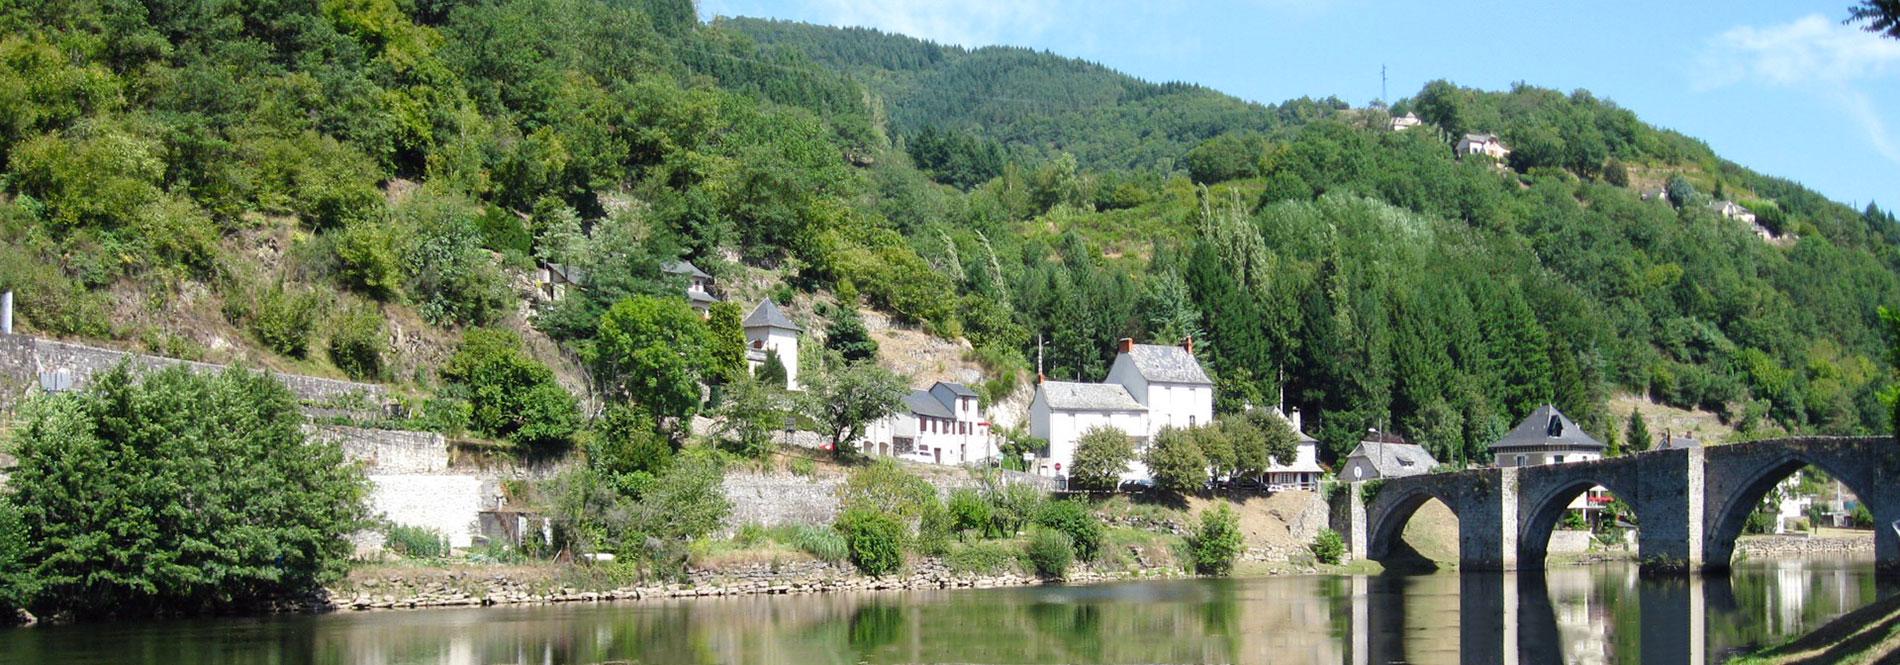 Camping Aveyron Votre Location Yelloh Village